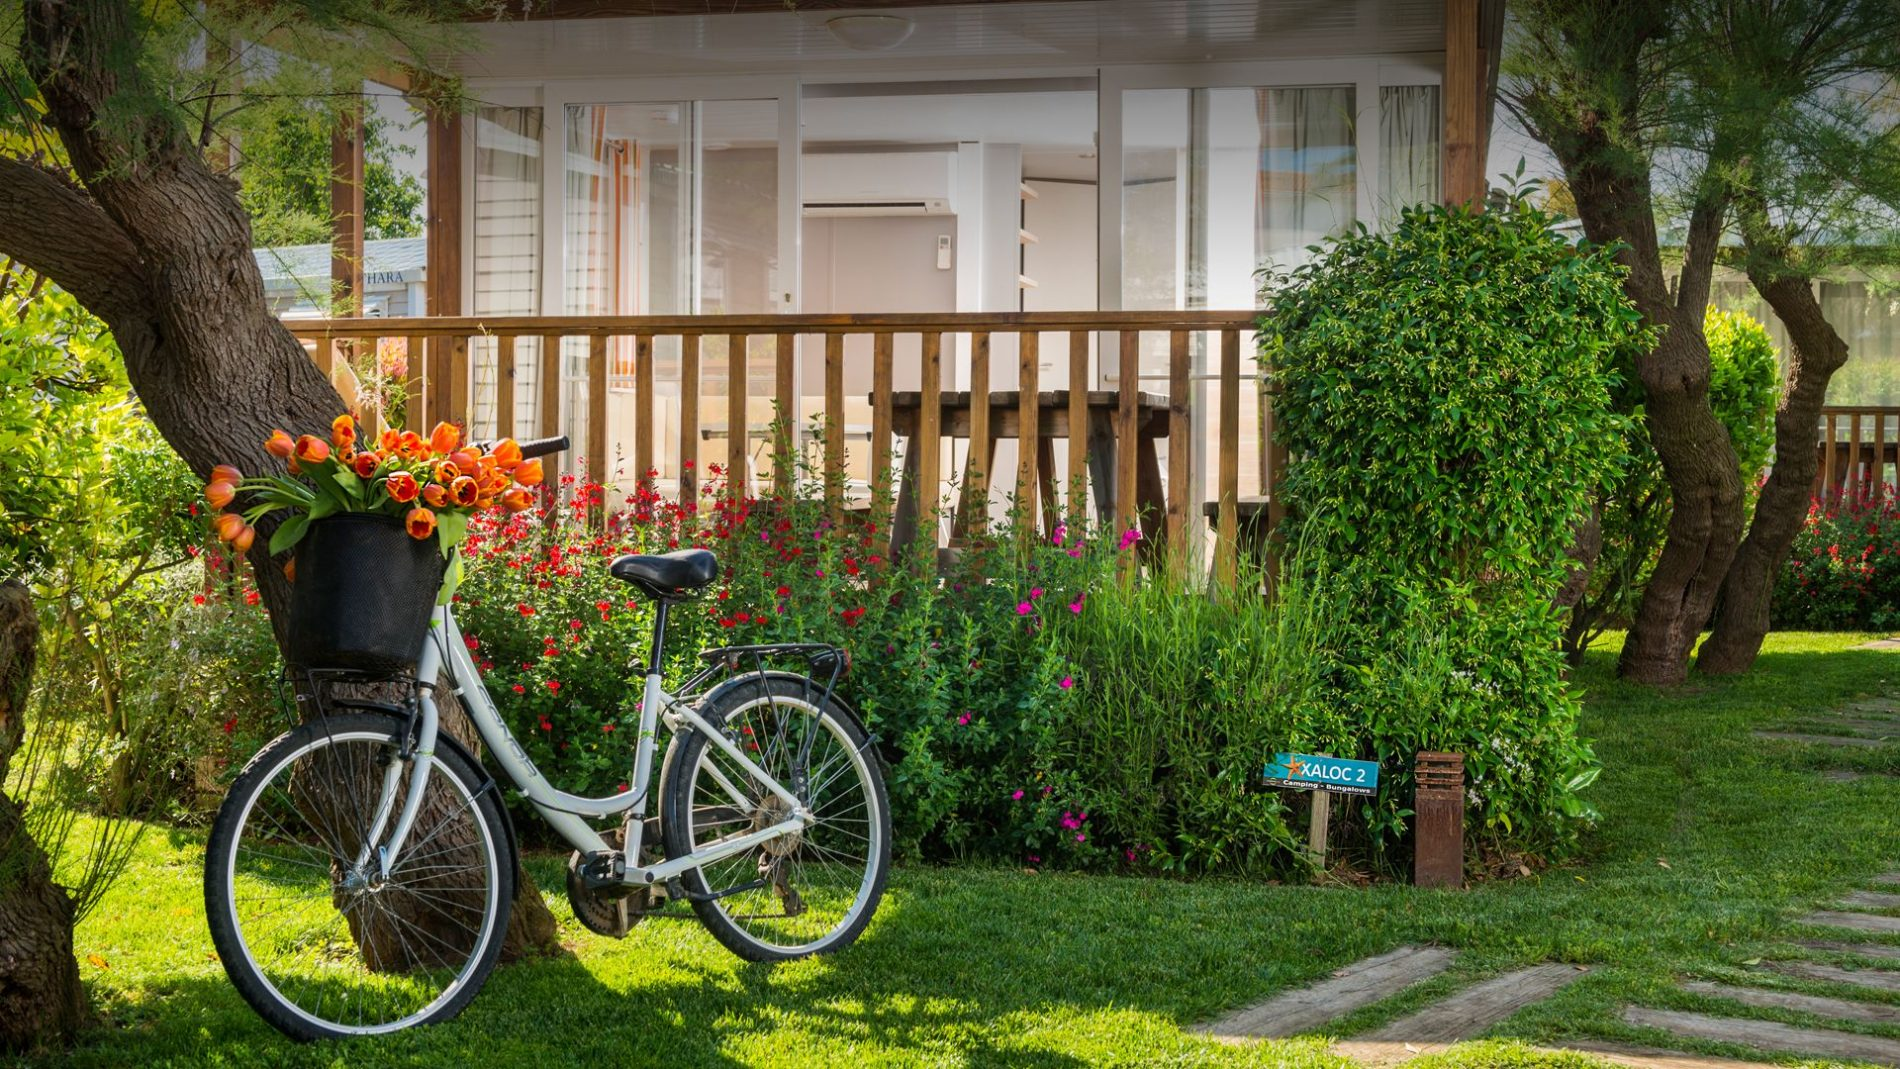 Càmping Salatà Bed & Bike